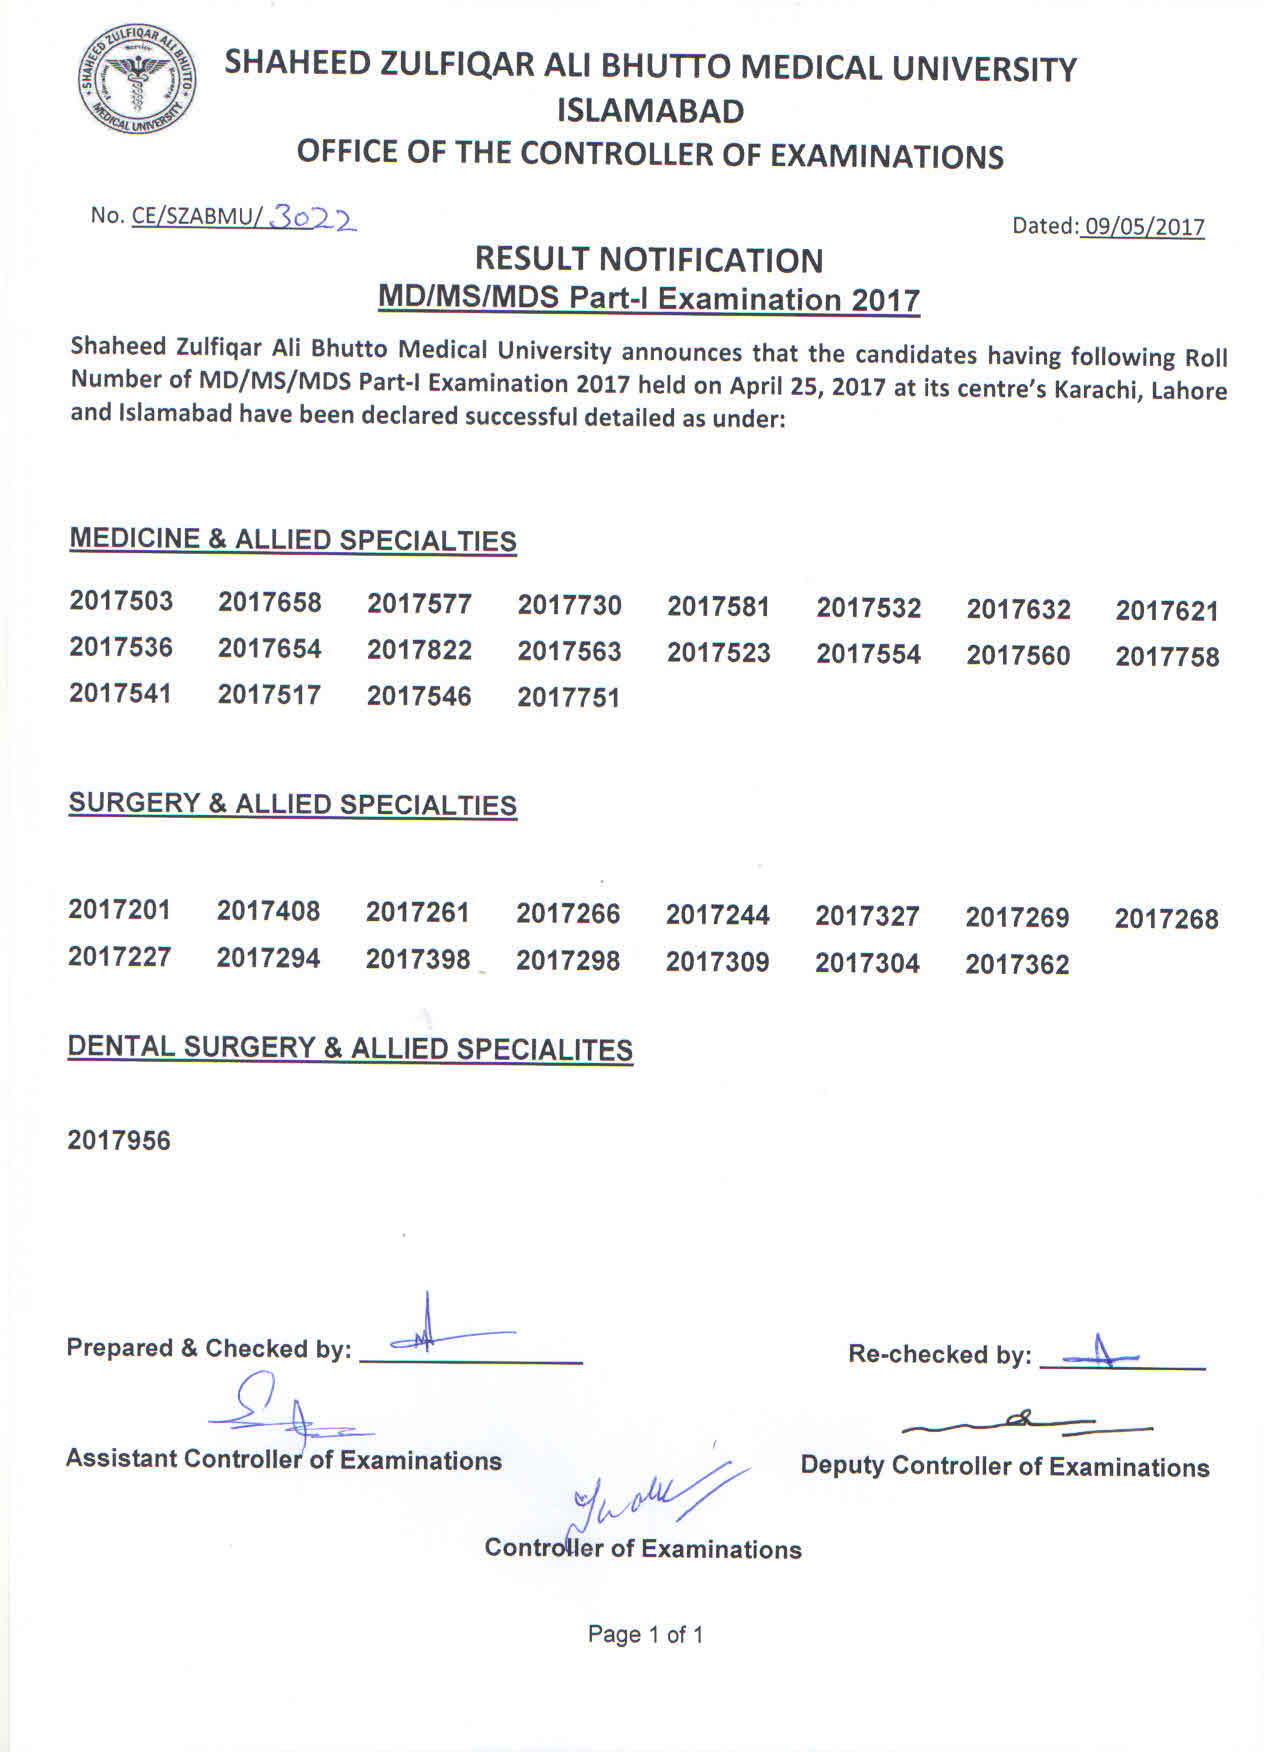 Result Notification - MS/MD/MDS Part 1 Examinations